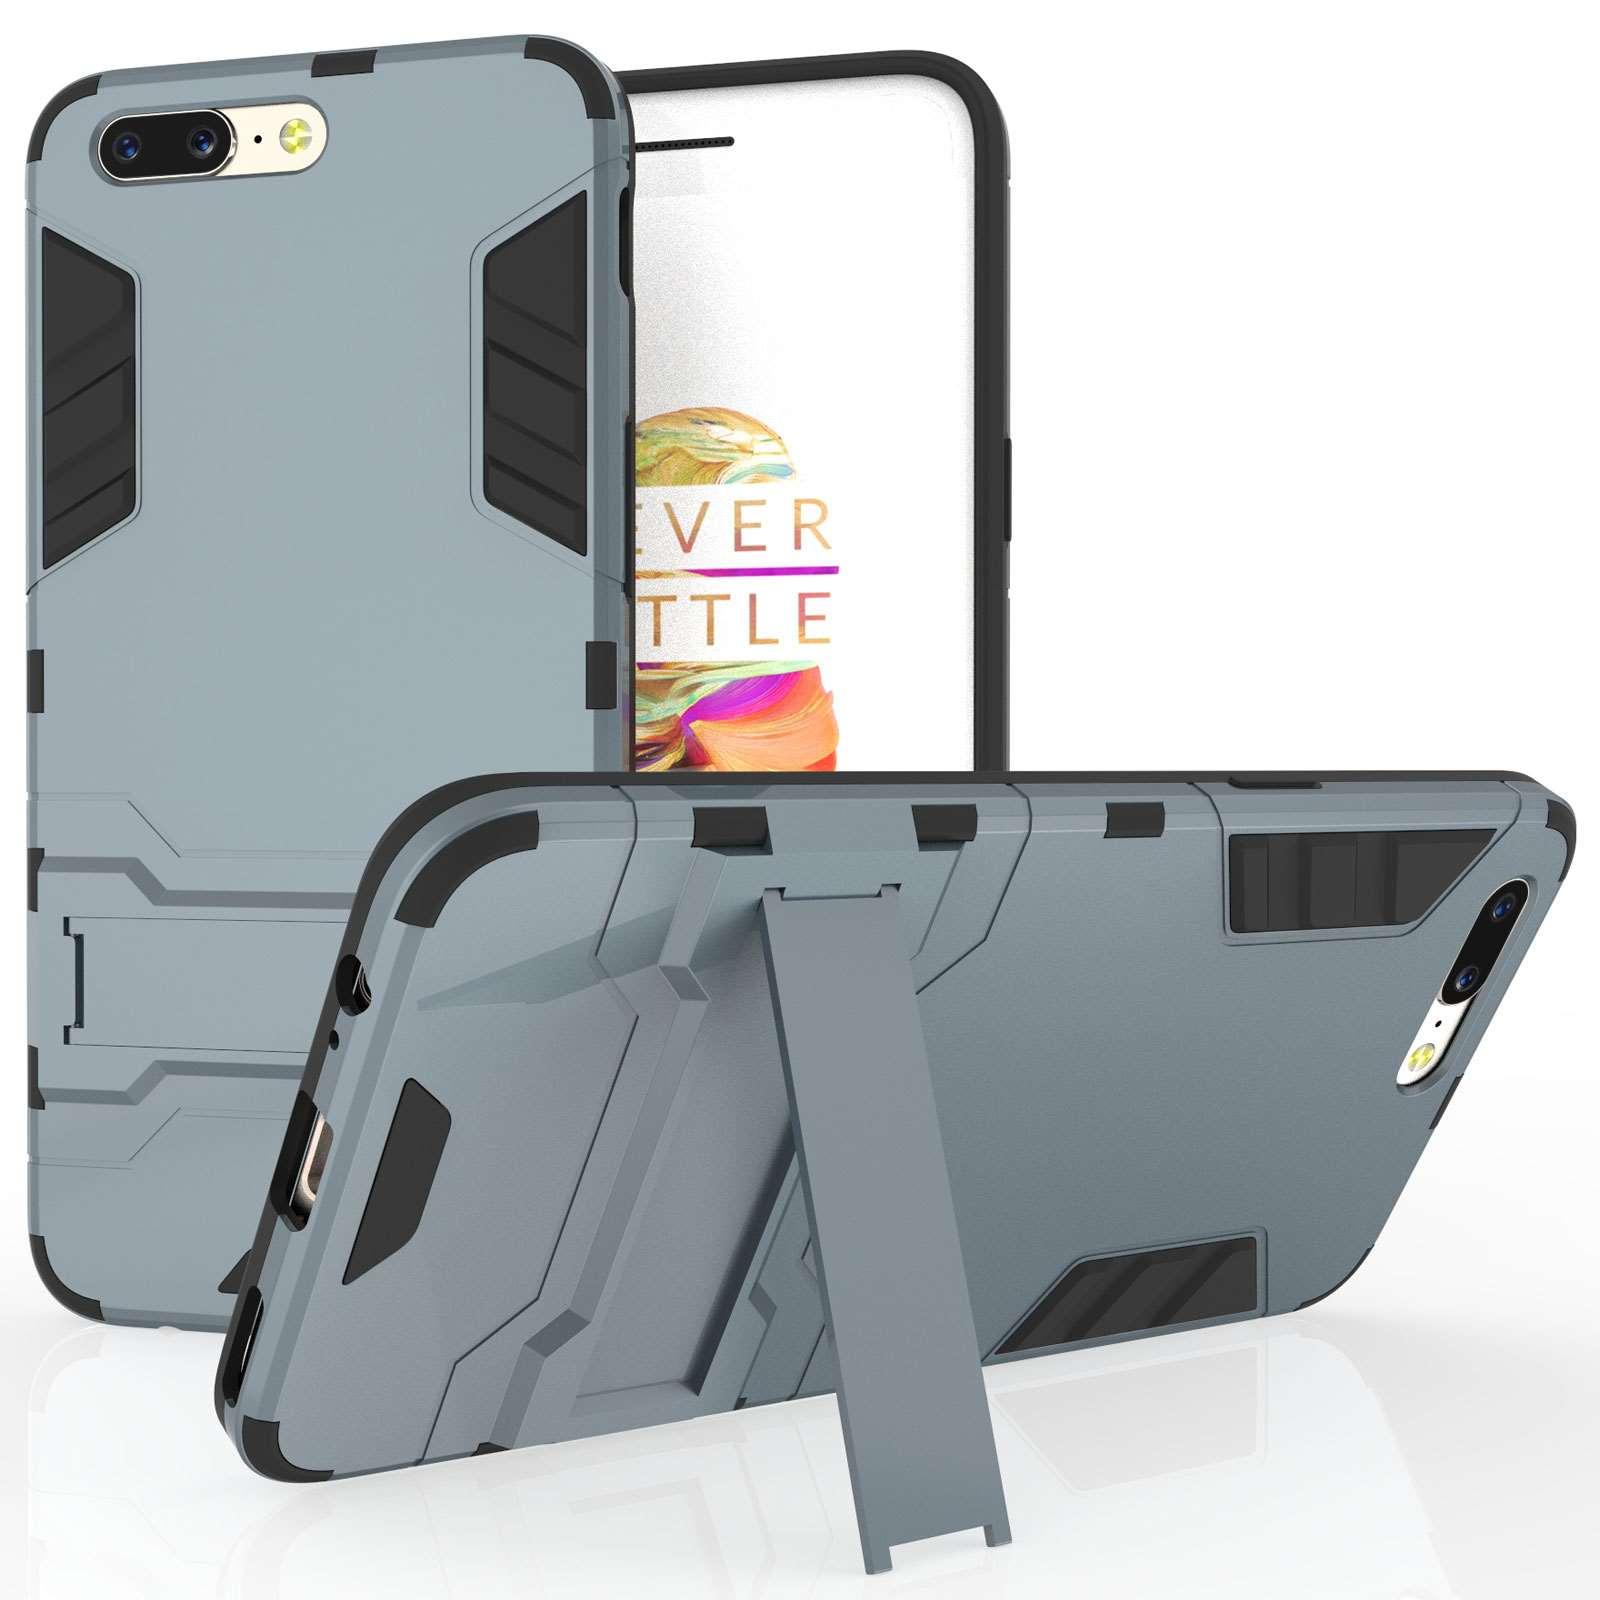 Caseflex Ανθεκτική Dual Layer Θήκη με Stand OnePlus 5 - Steel Blue (X000QHSWMX)